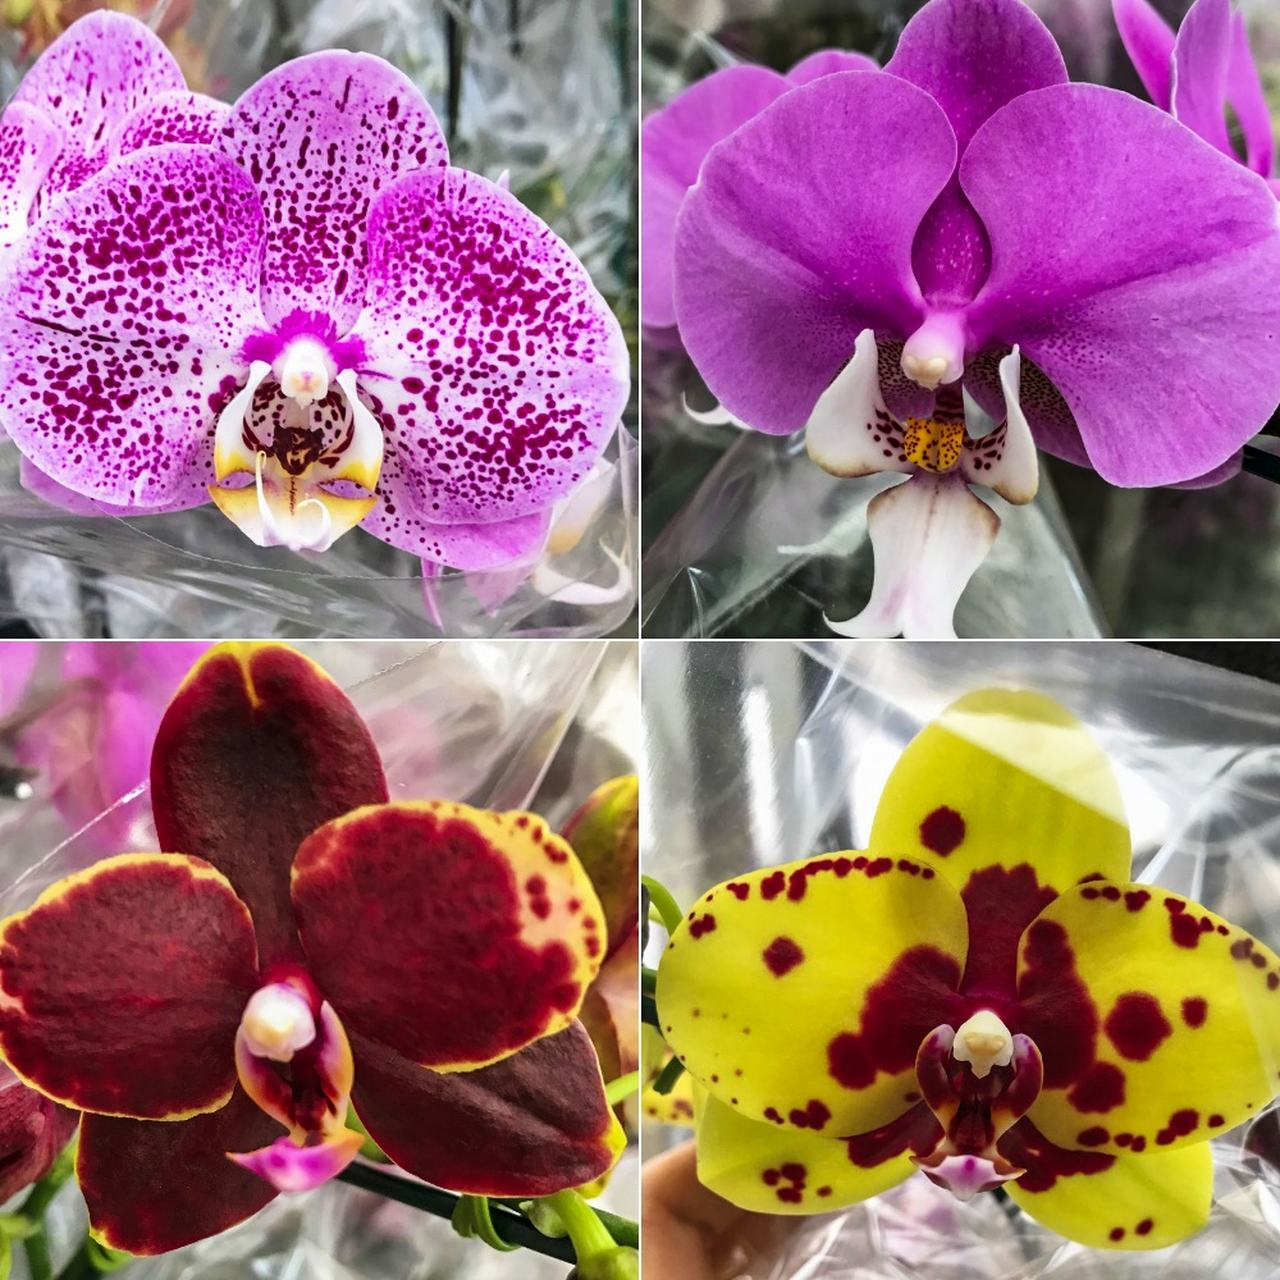 kit 10 mudas de Orquídea Phalaenopsis  - ORQUIDEA GARDEN